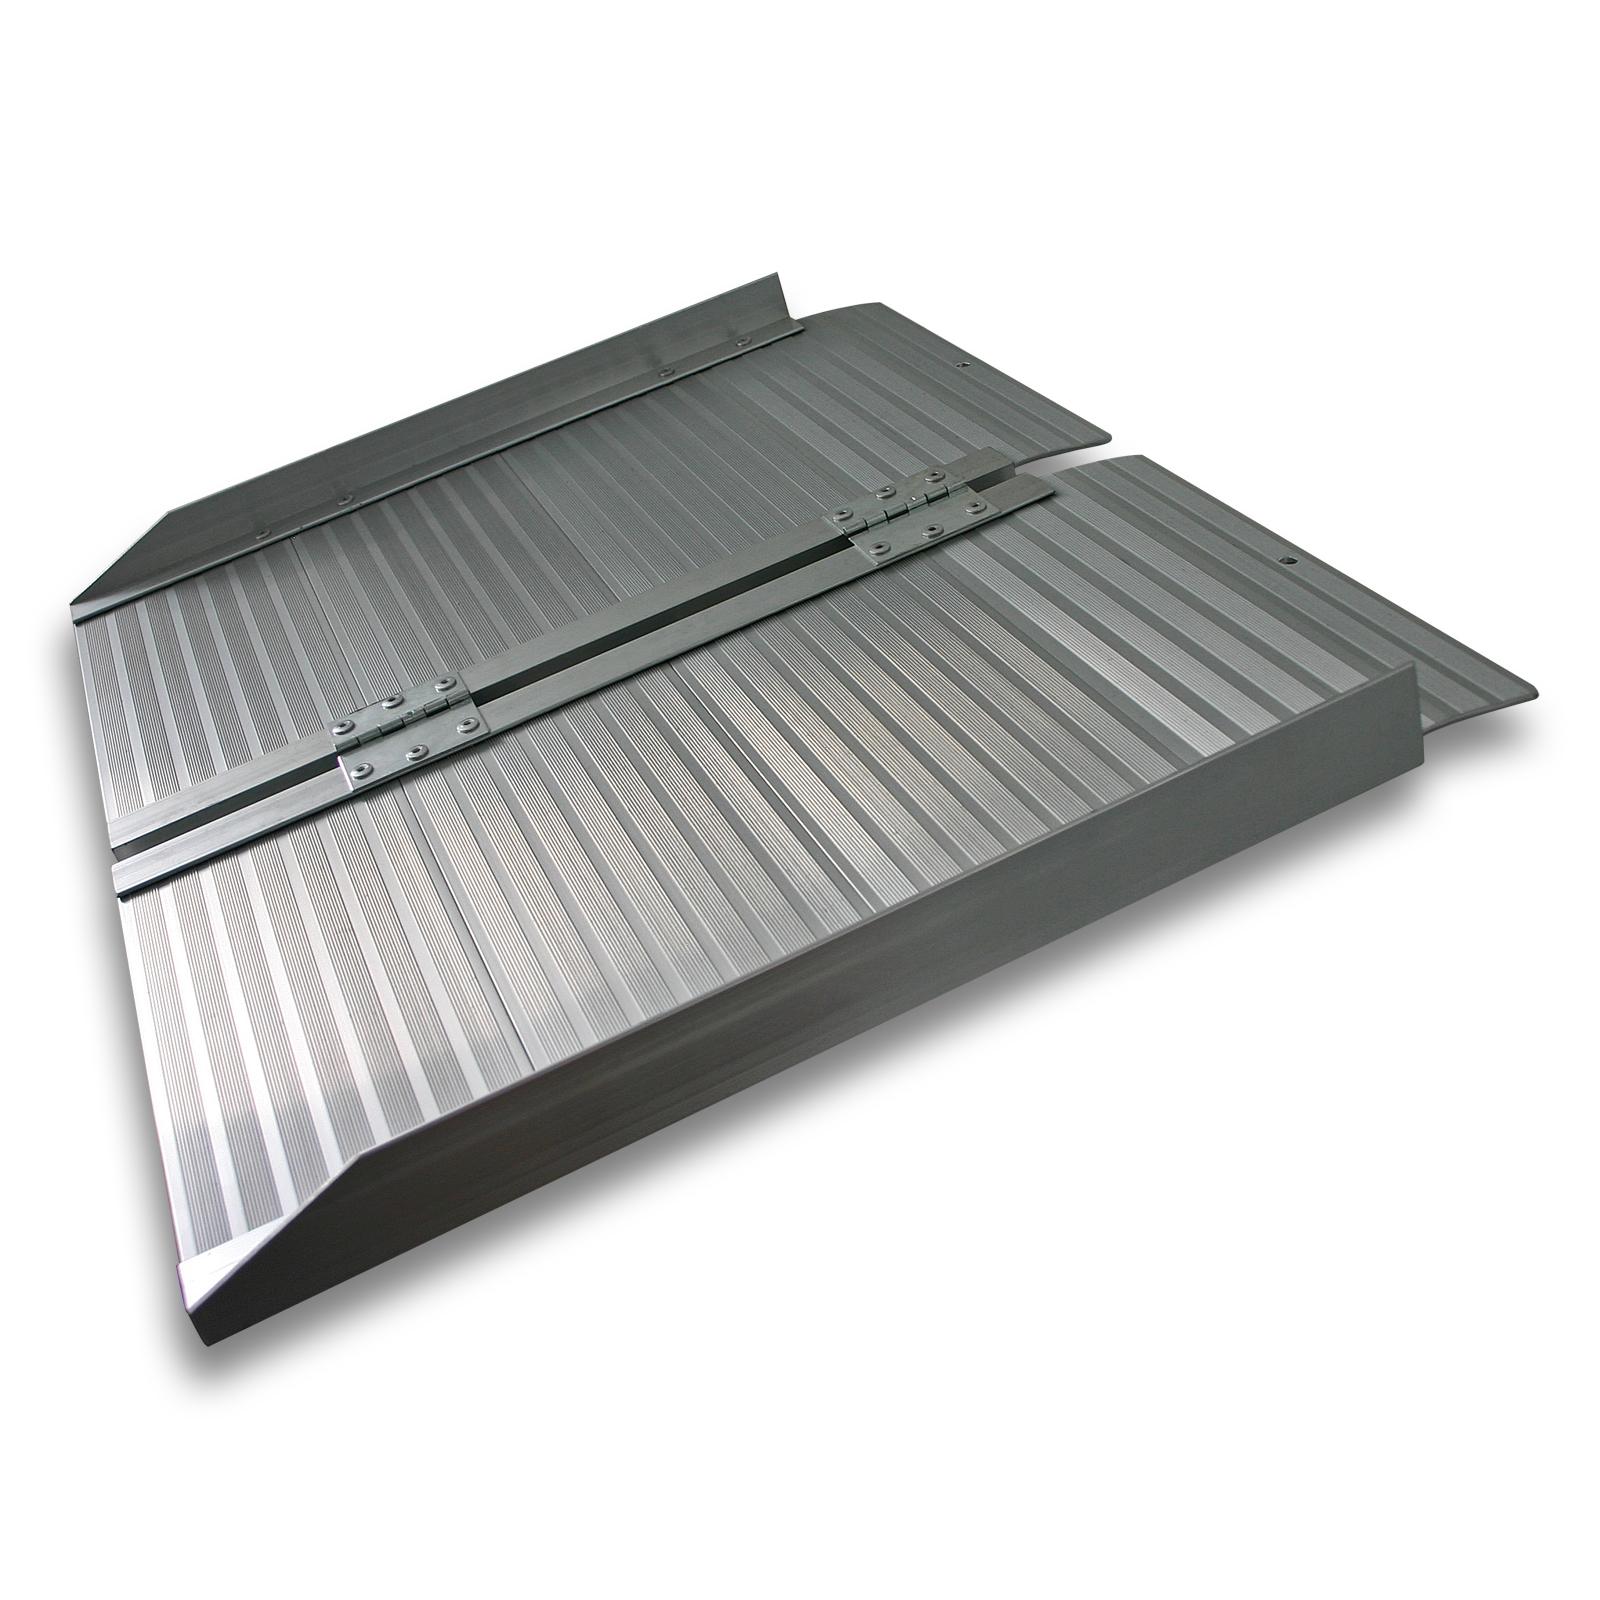 Diverse-varianti-Sedia-A-Rotelle-Rampa-pieghevole-pieghevole-rampa-sedia-a-rotelle-in-alluminio